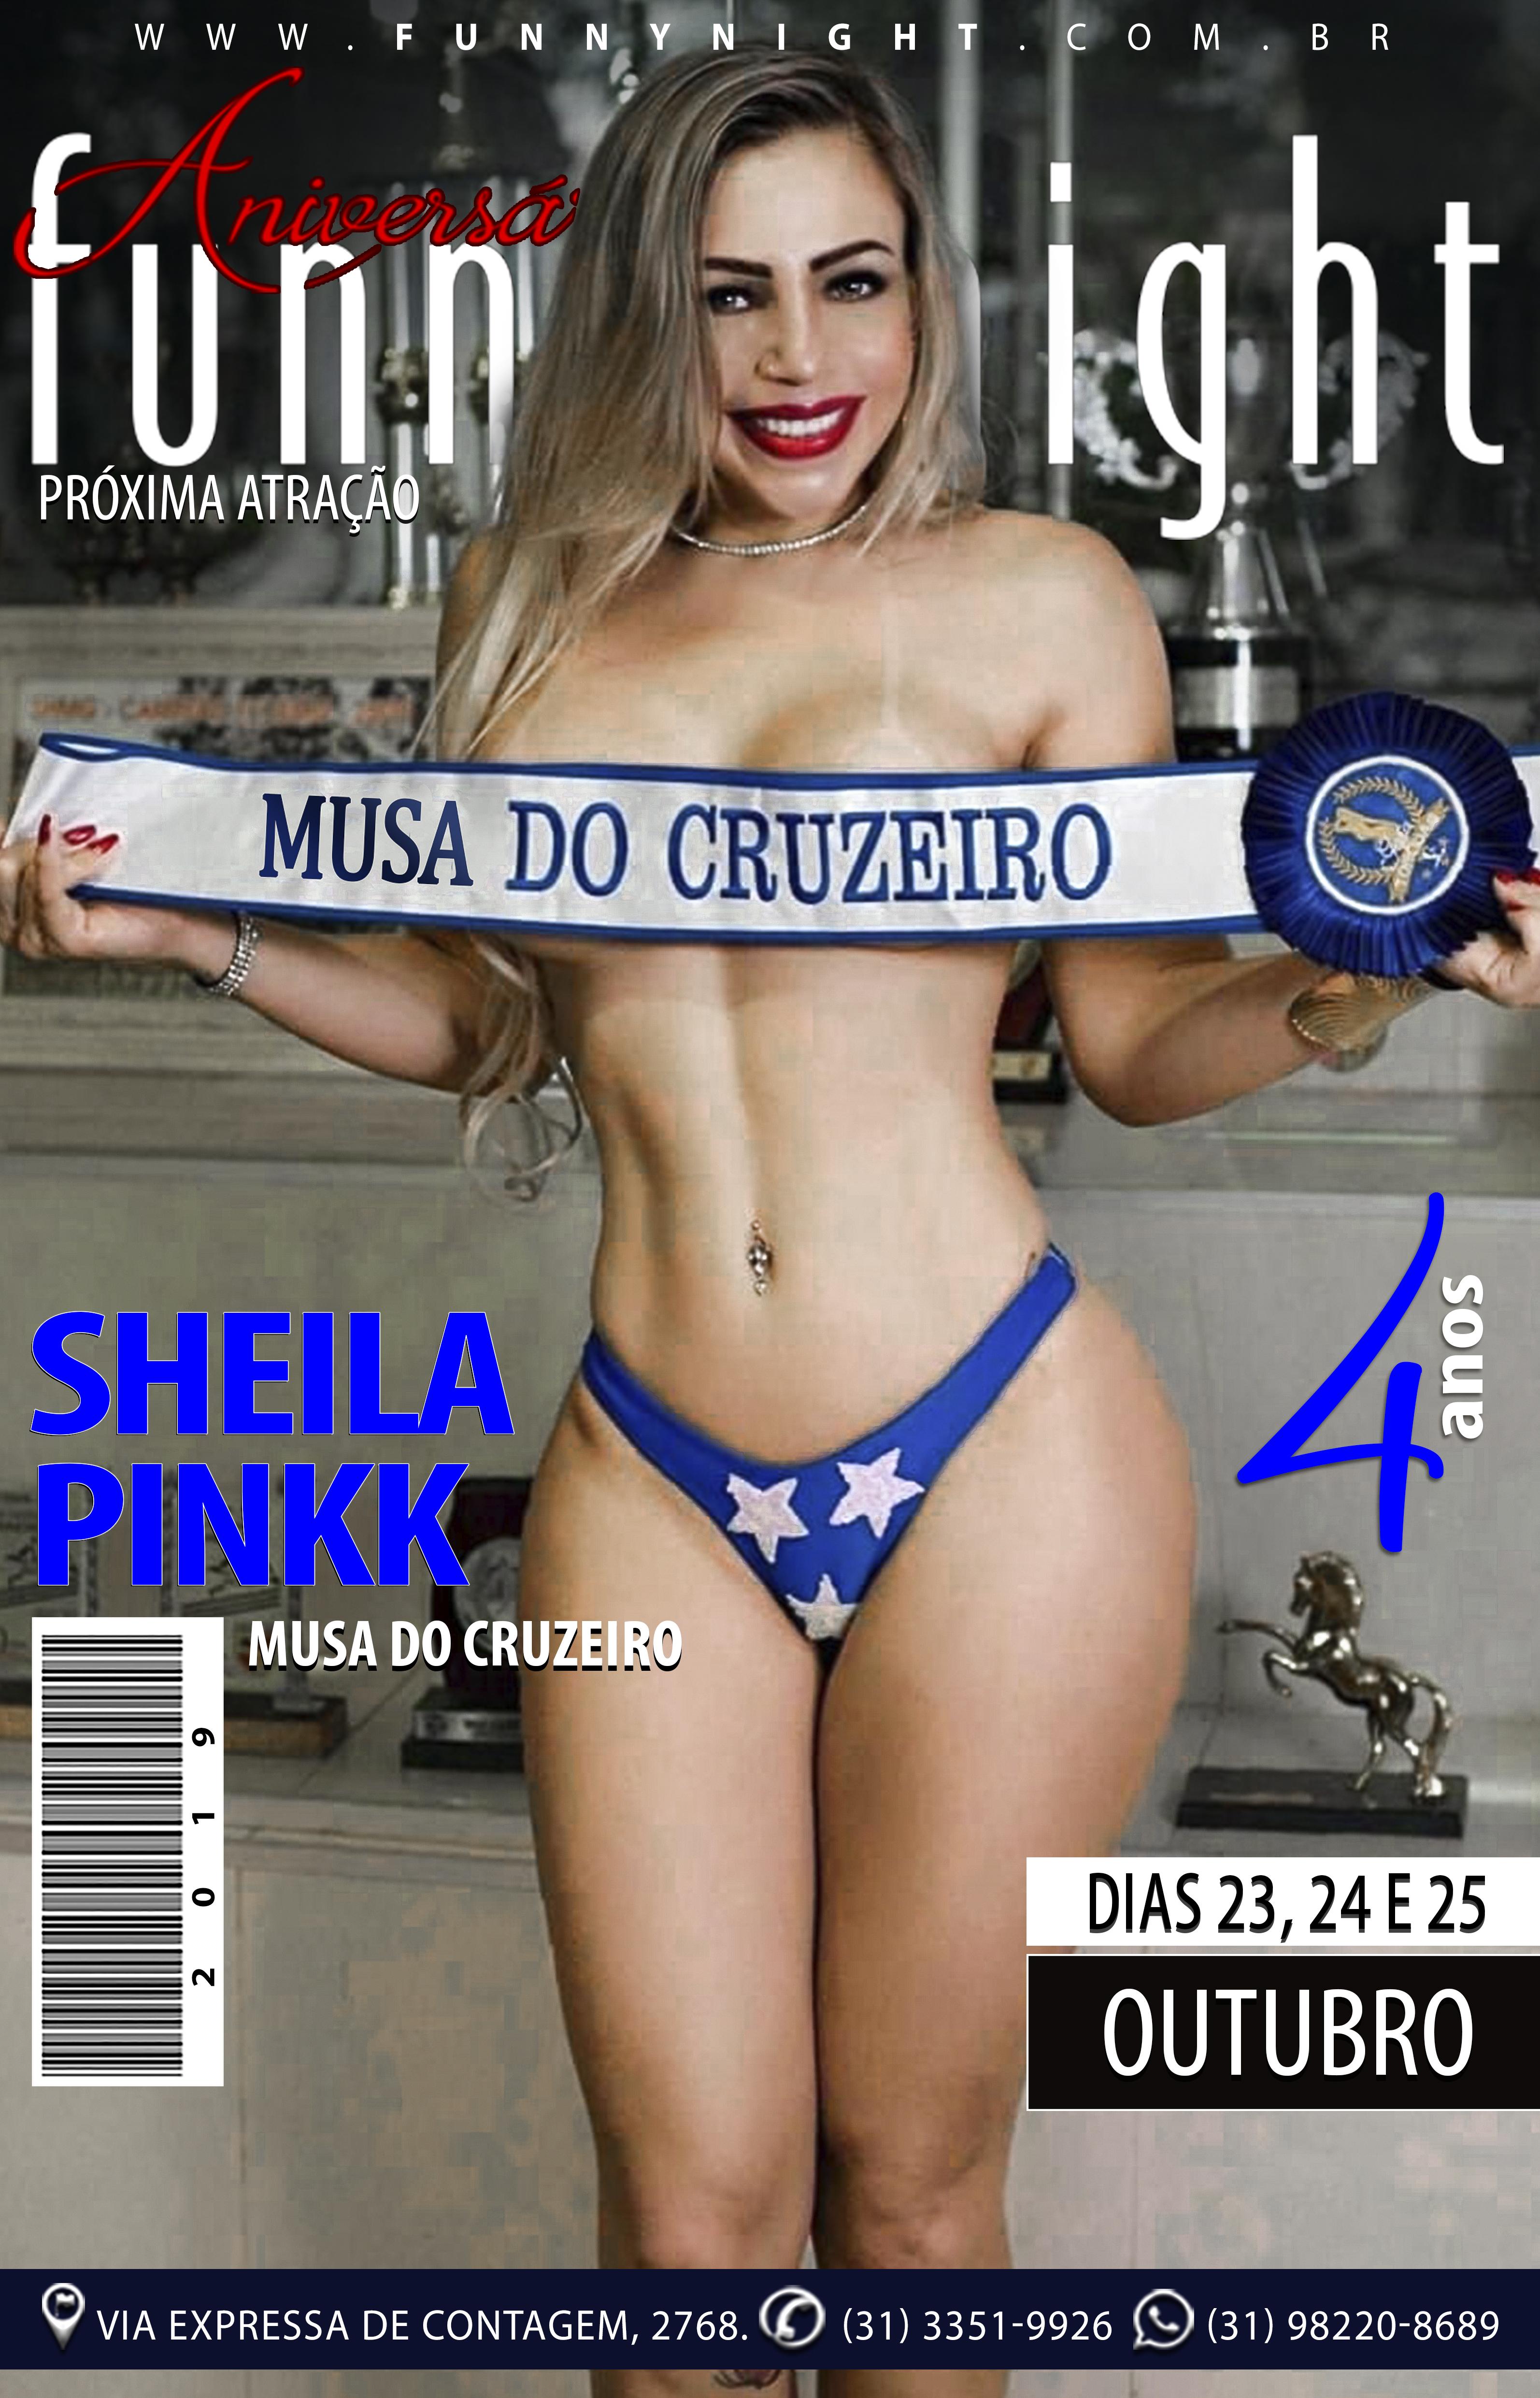 SHEILA PINKK